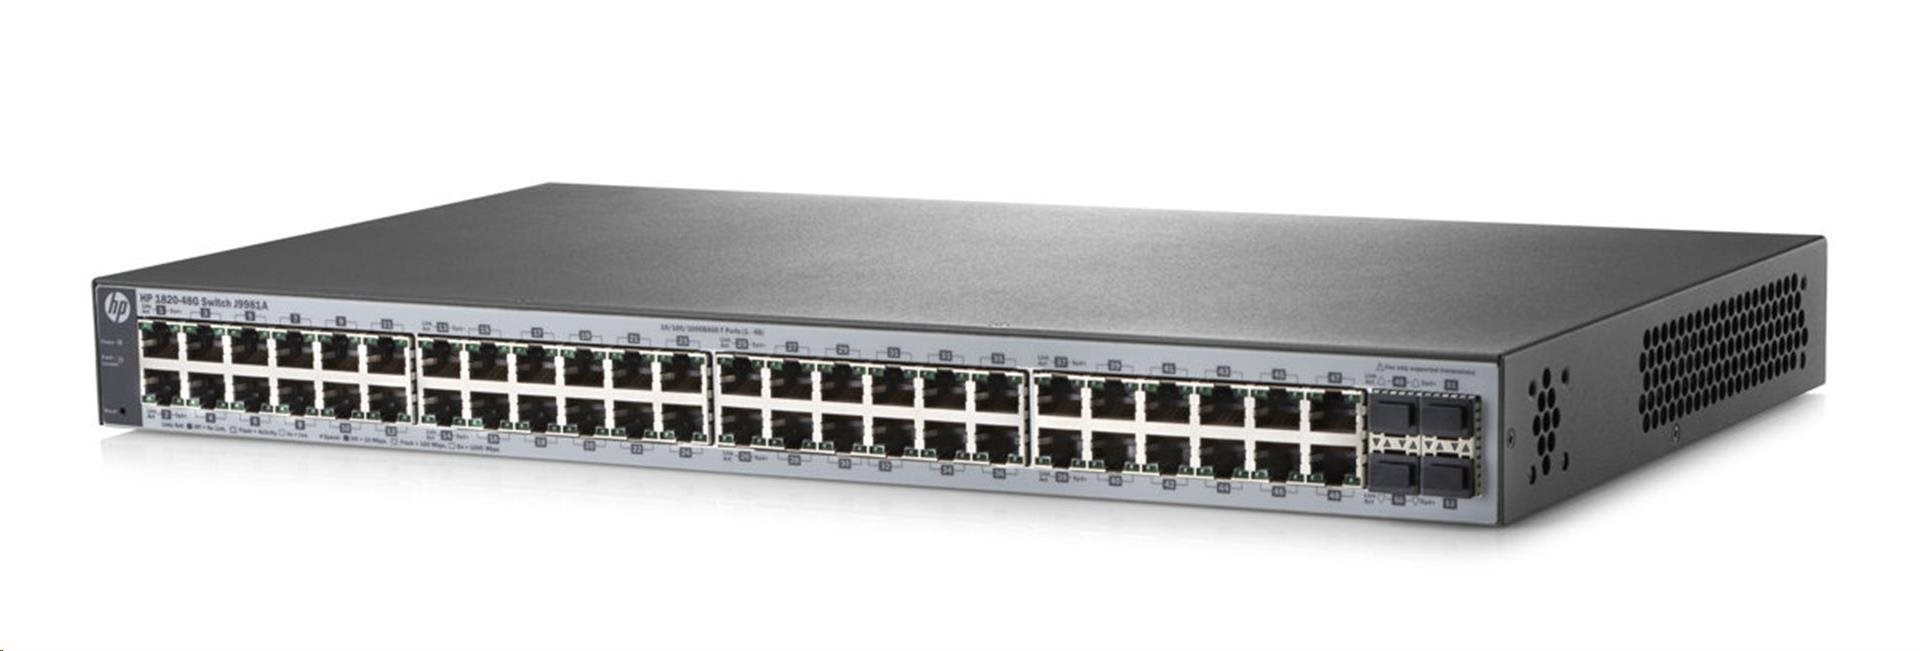 HPE 1820 48G Switch